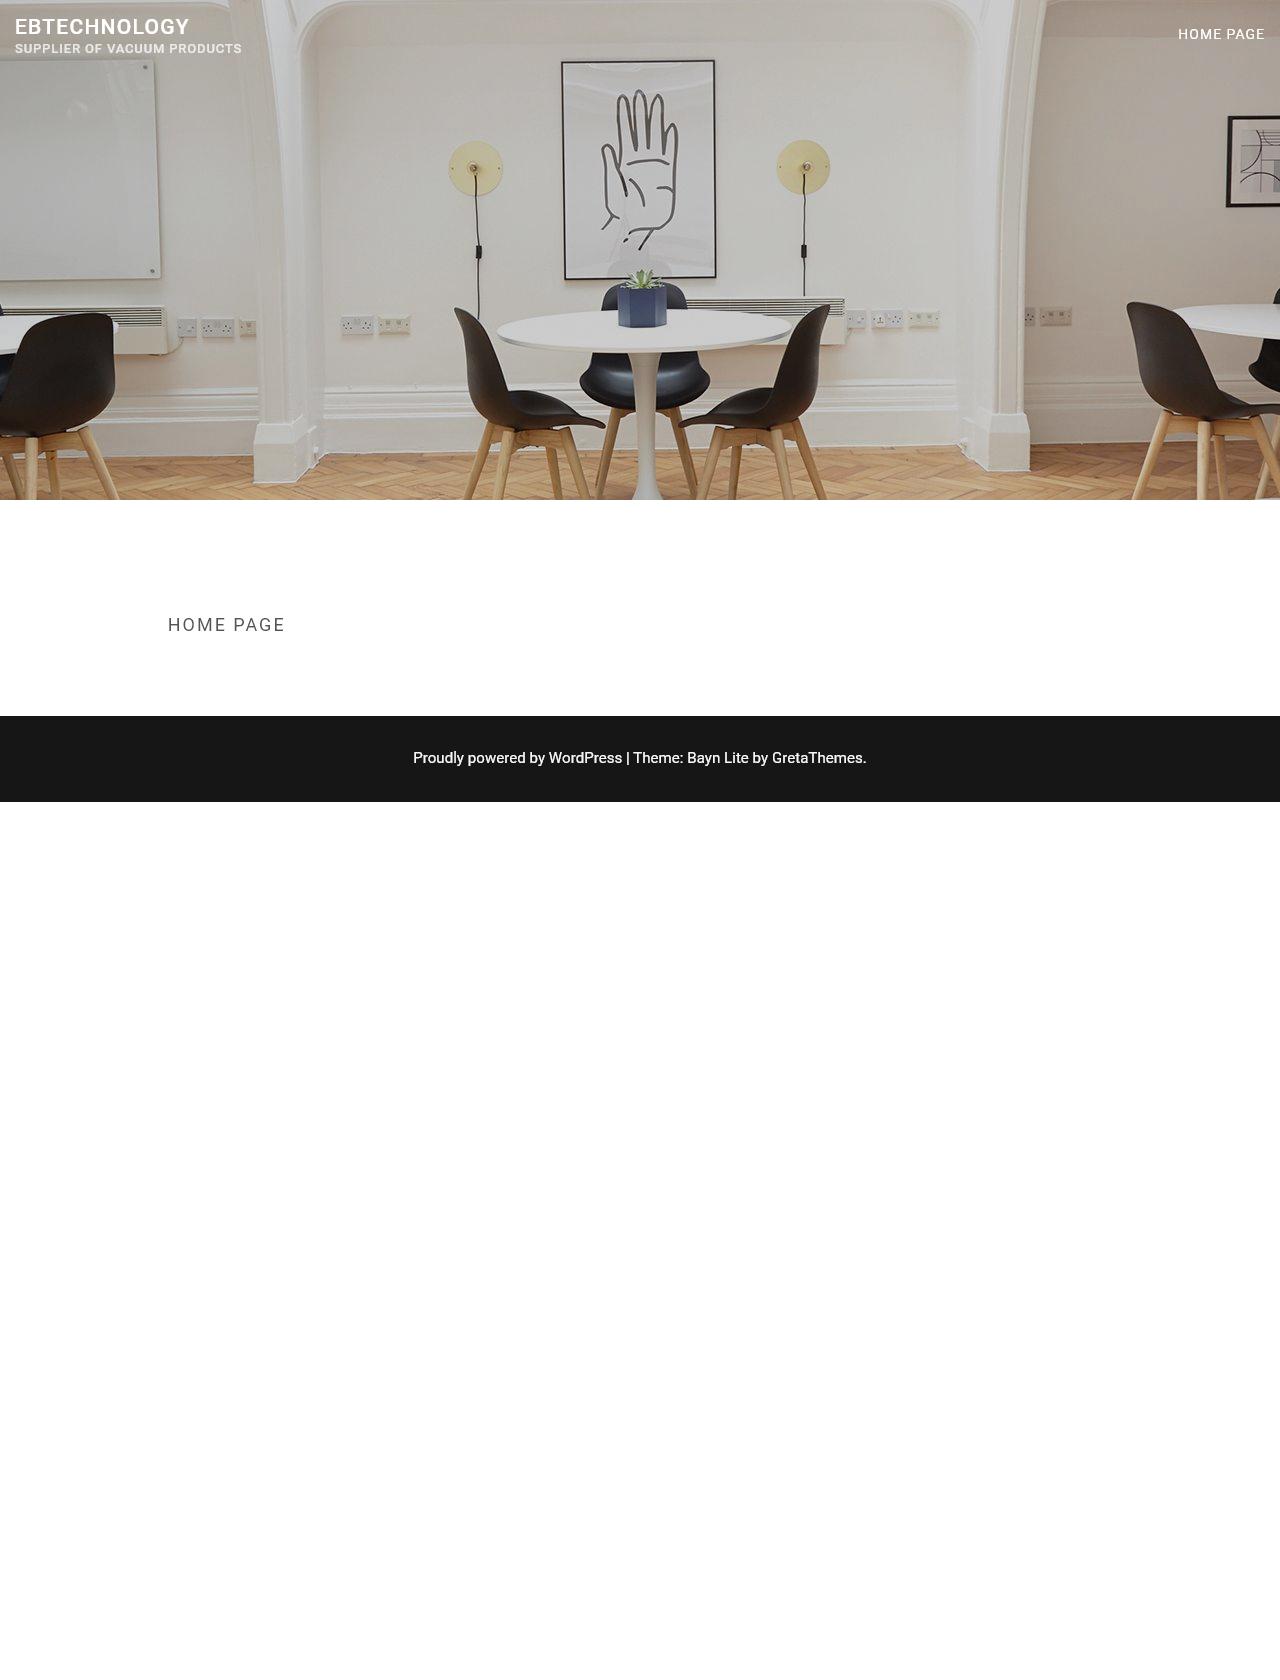 Screenshot Desktop - https://www.ebtech.co.za/